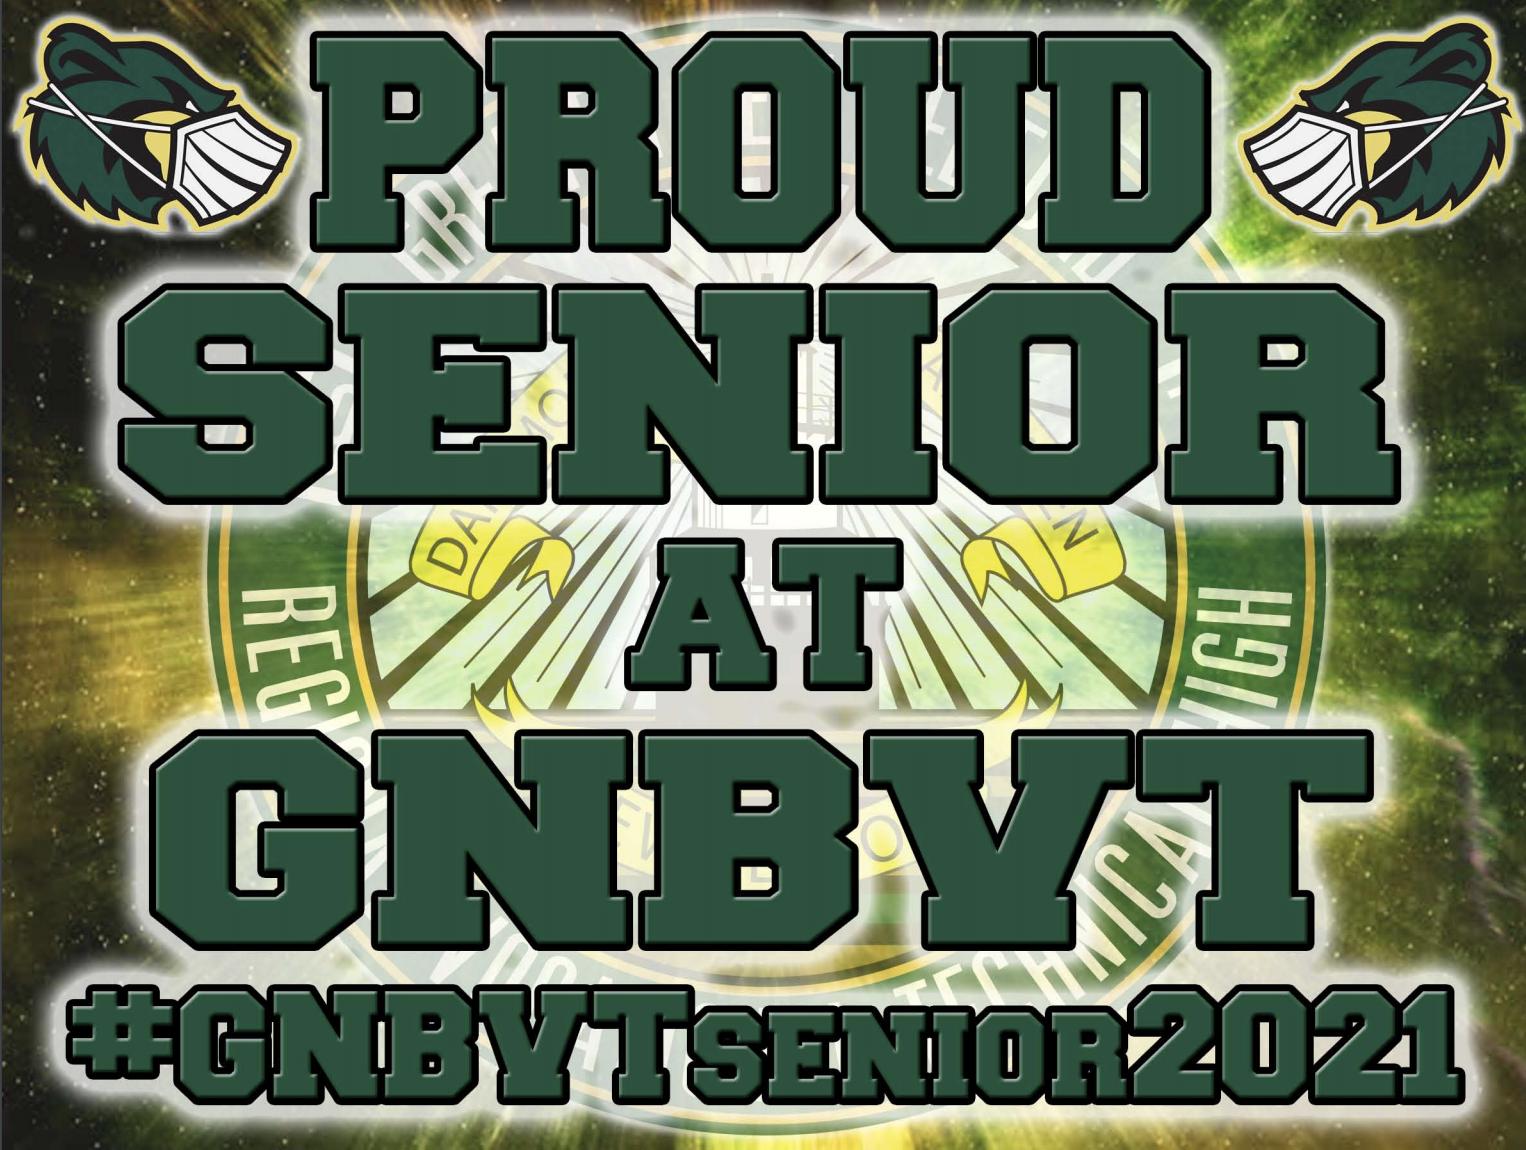 Proud Senior at GNBVT #GNBVTsenior2021 Sign